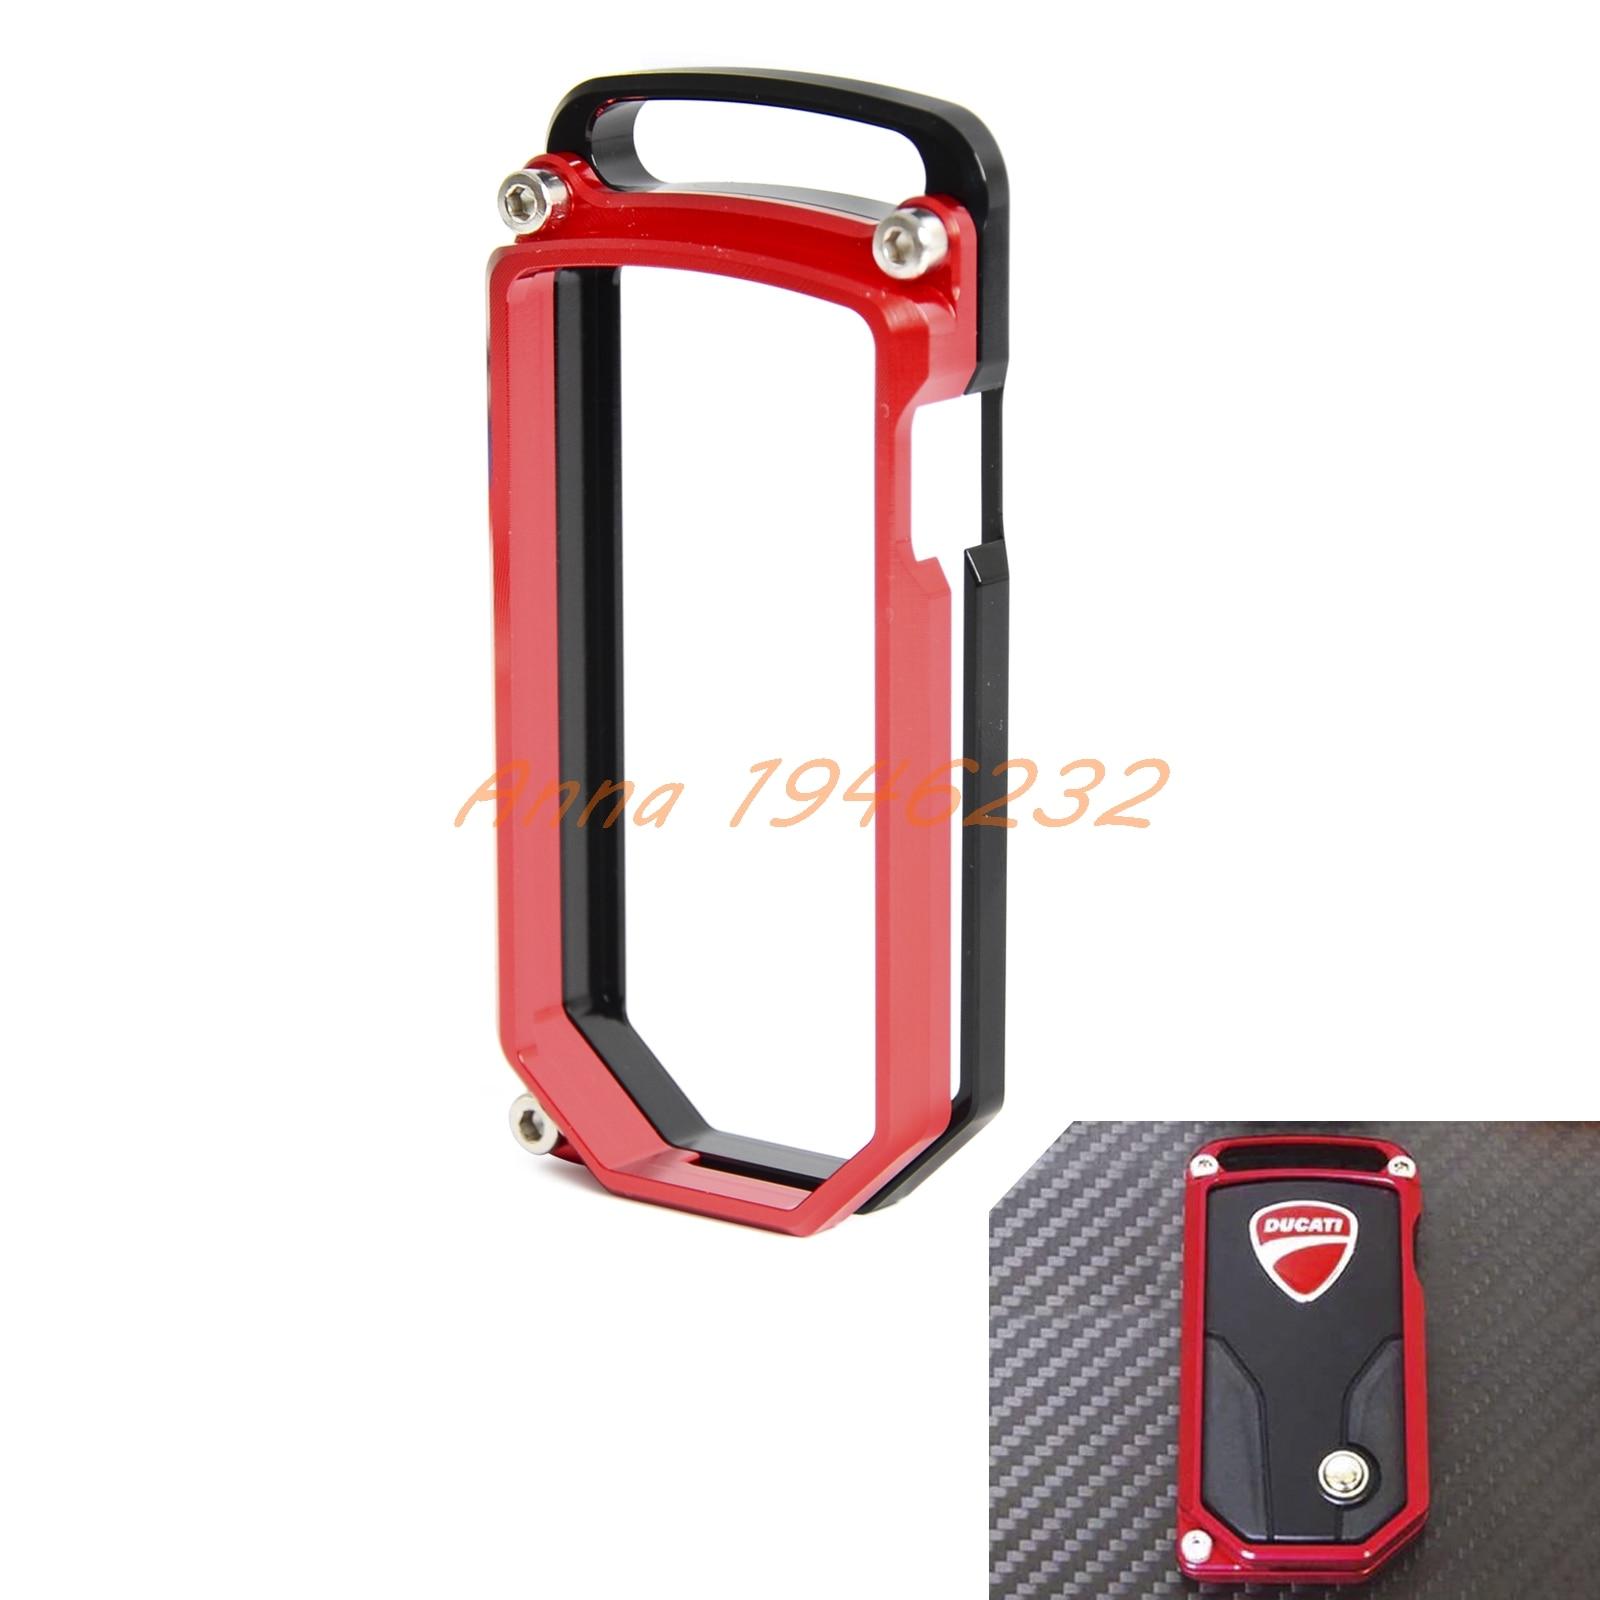 CNC Key Case SMART KEY COVER for Ducati Diavel 2011 2016 Multitrada 1200 S 2010 2014